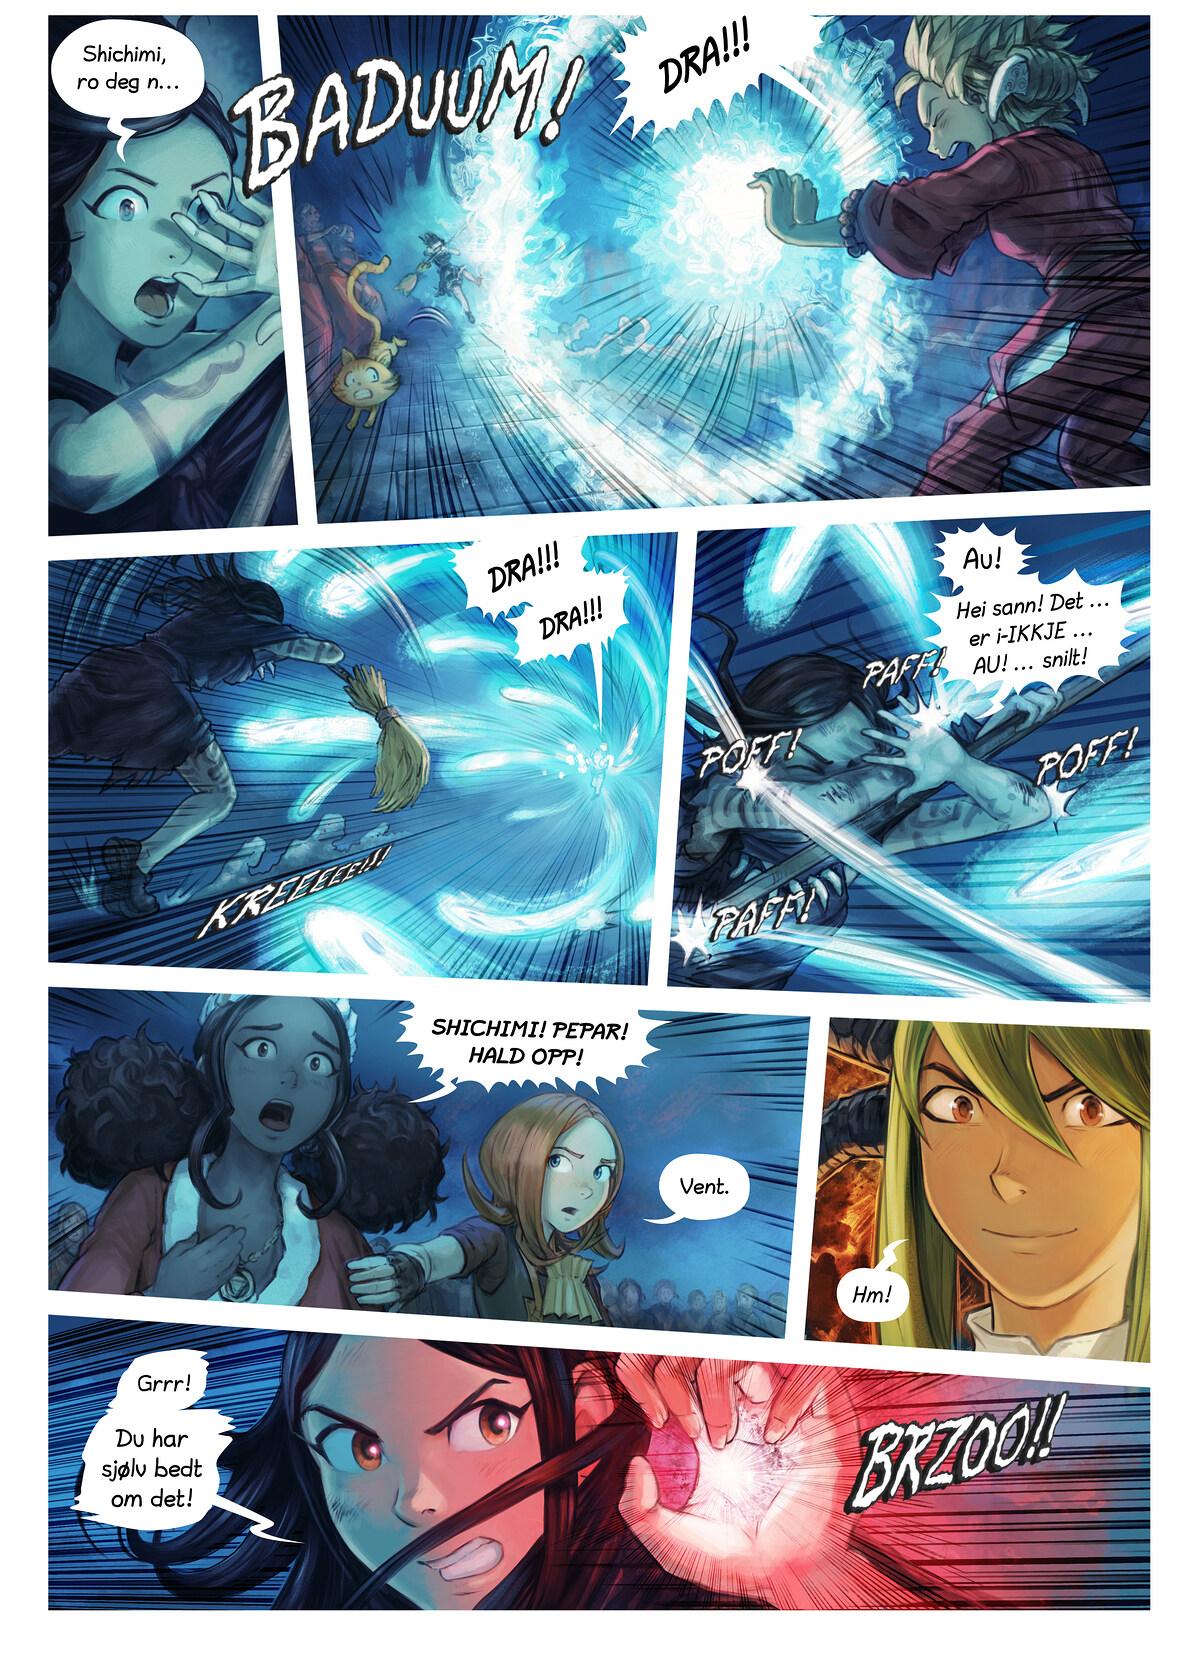 Episode 34: Riddarseremoni for Shichimi, Side 6